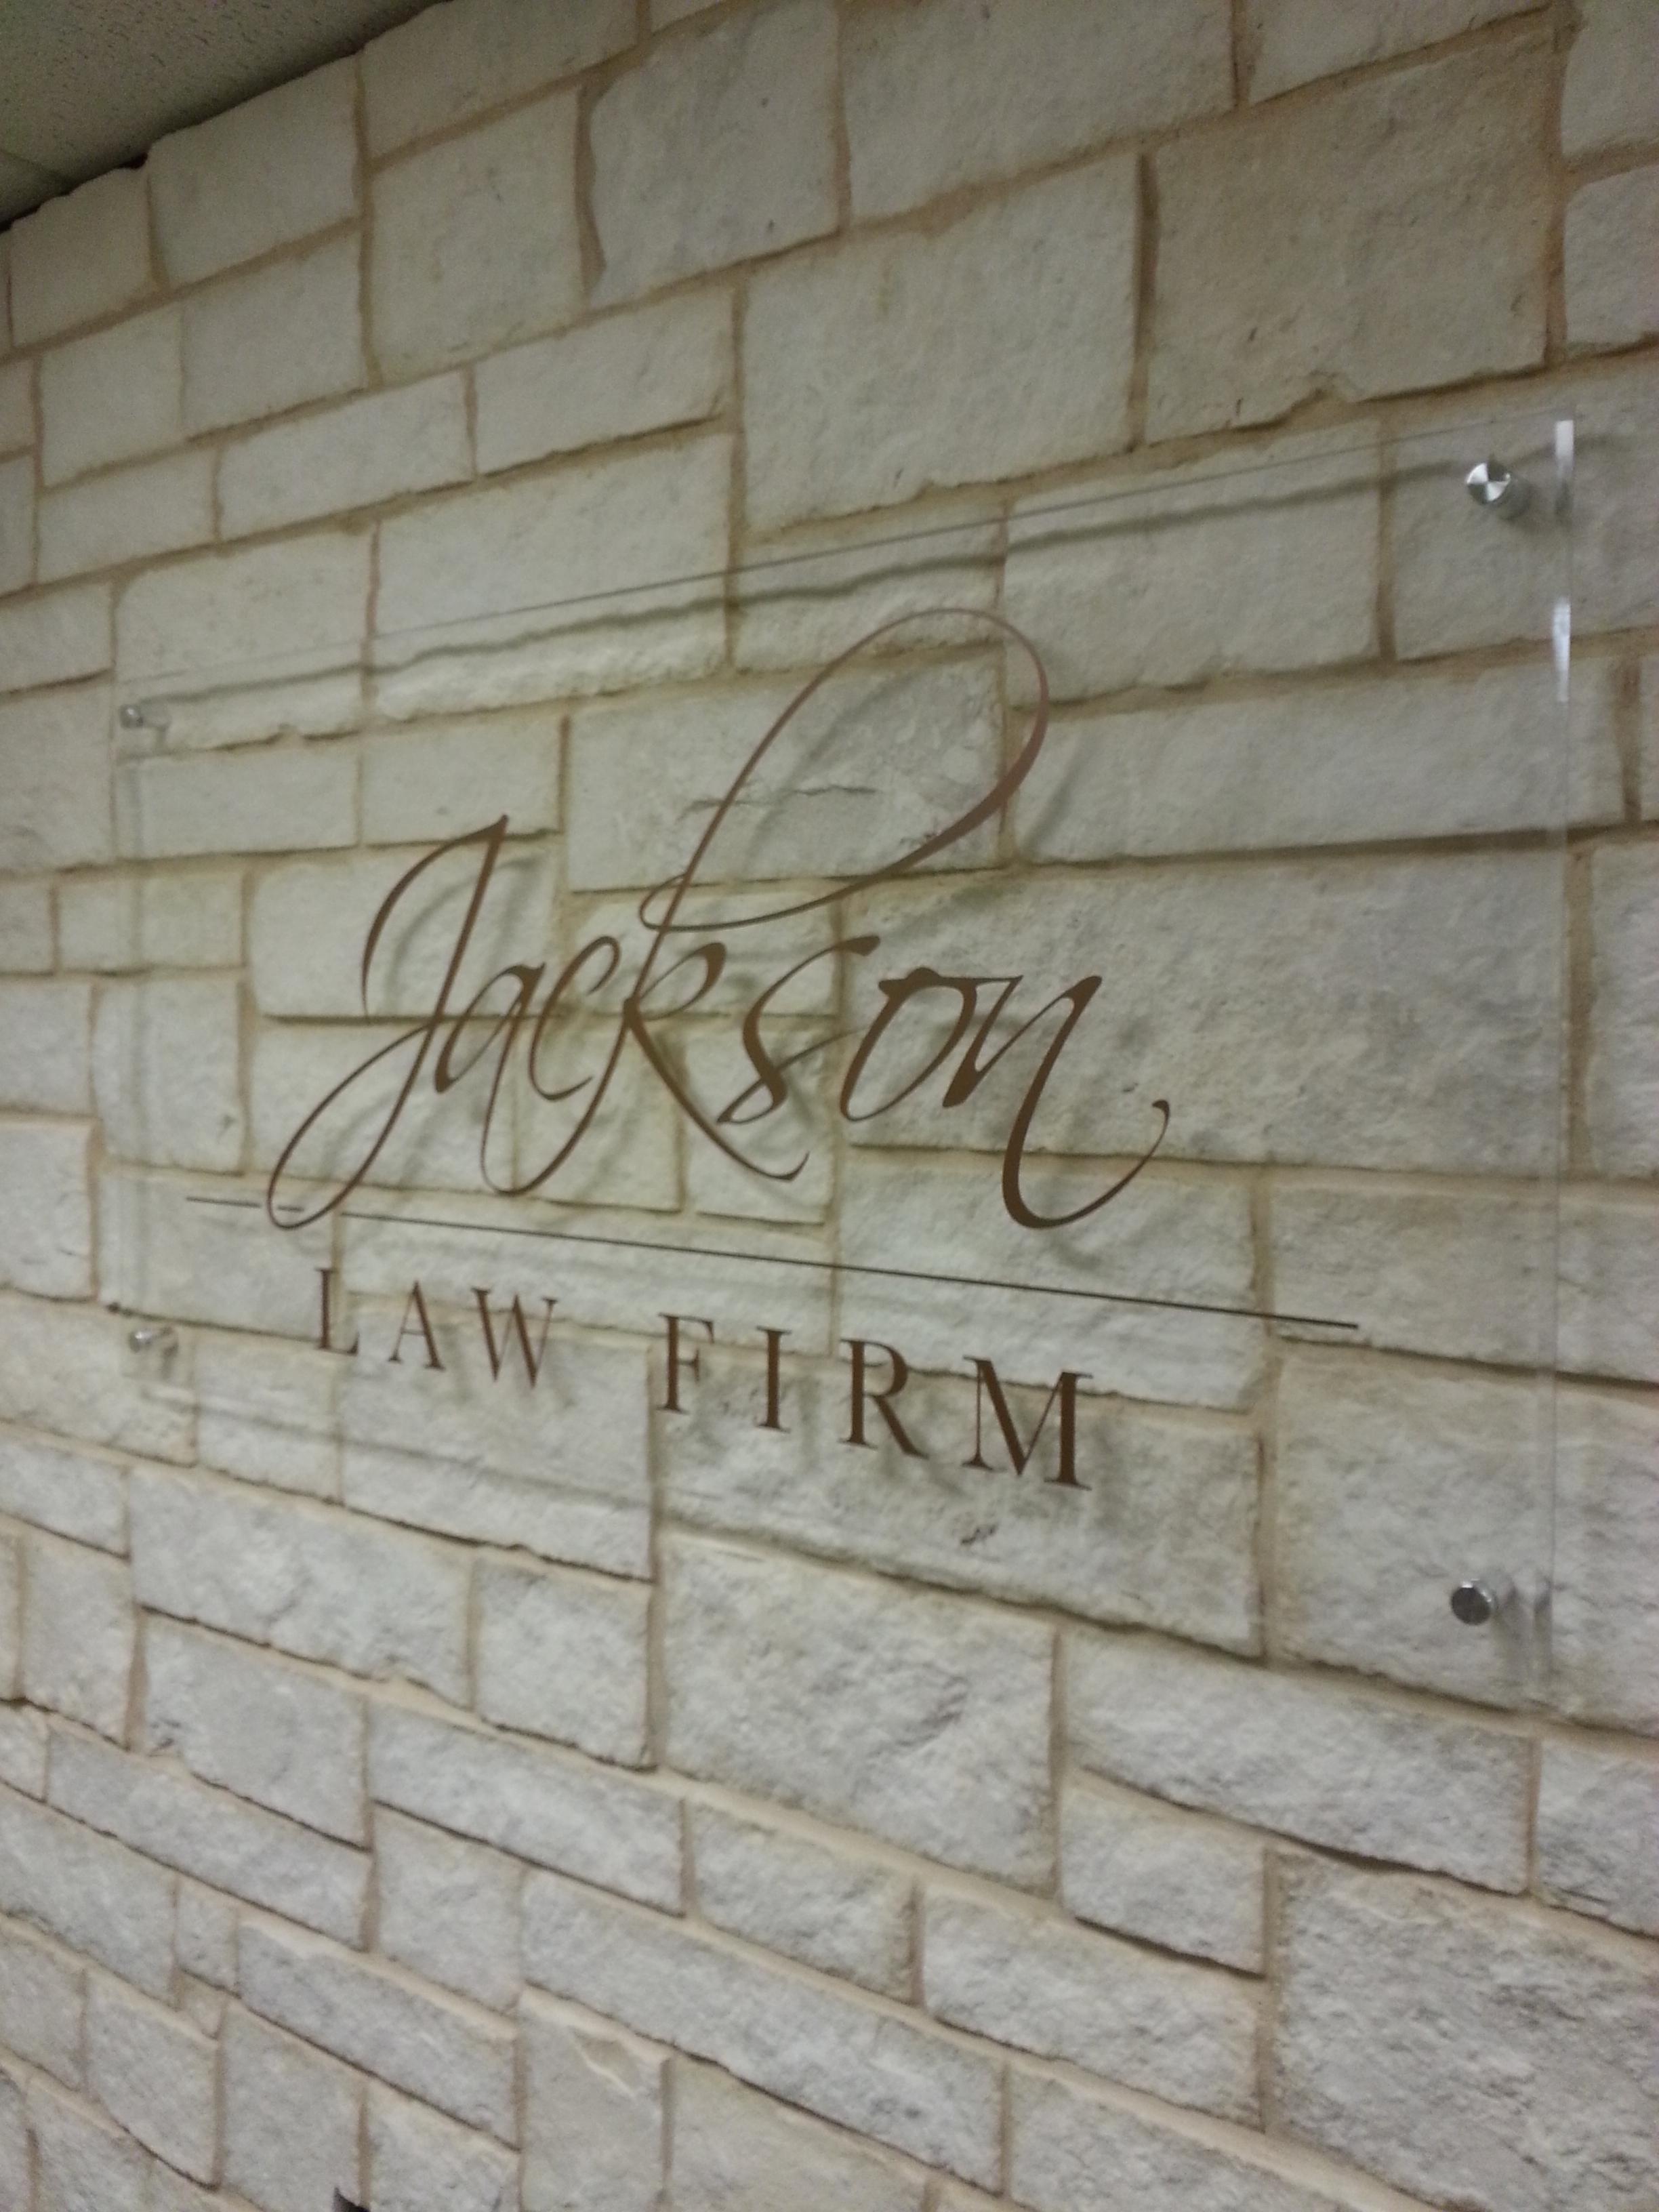 Justin Jackson - Jackson Law - lk41372 - 5.jpg